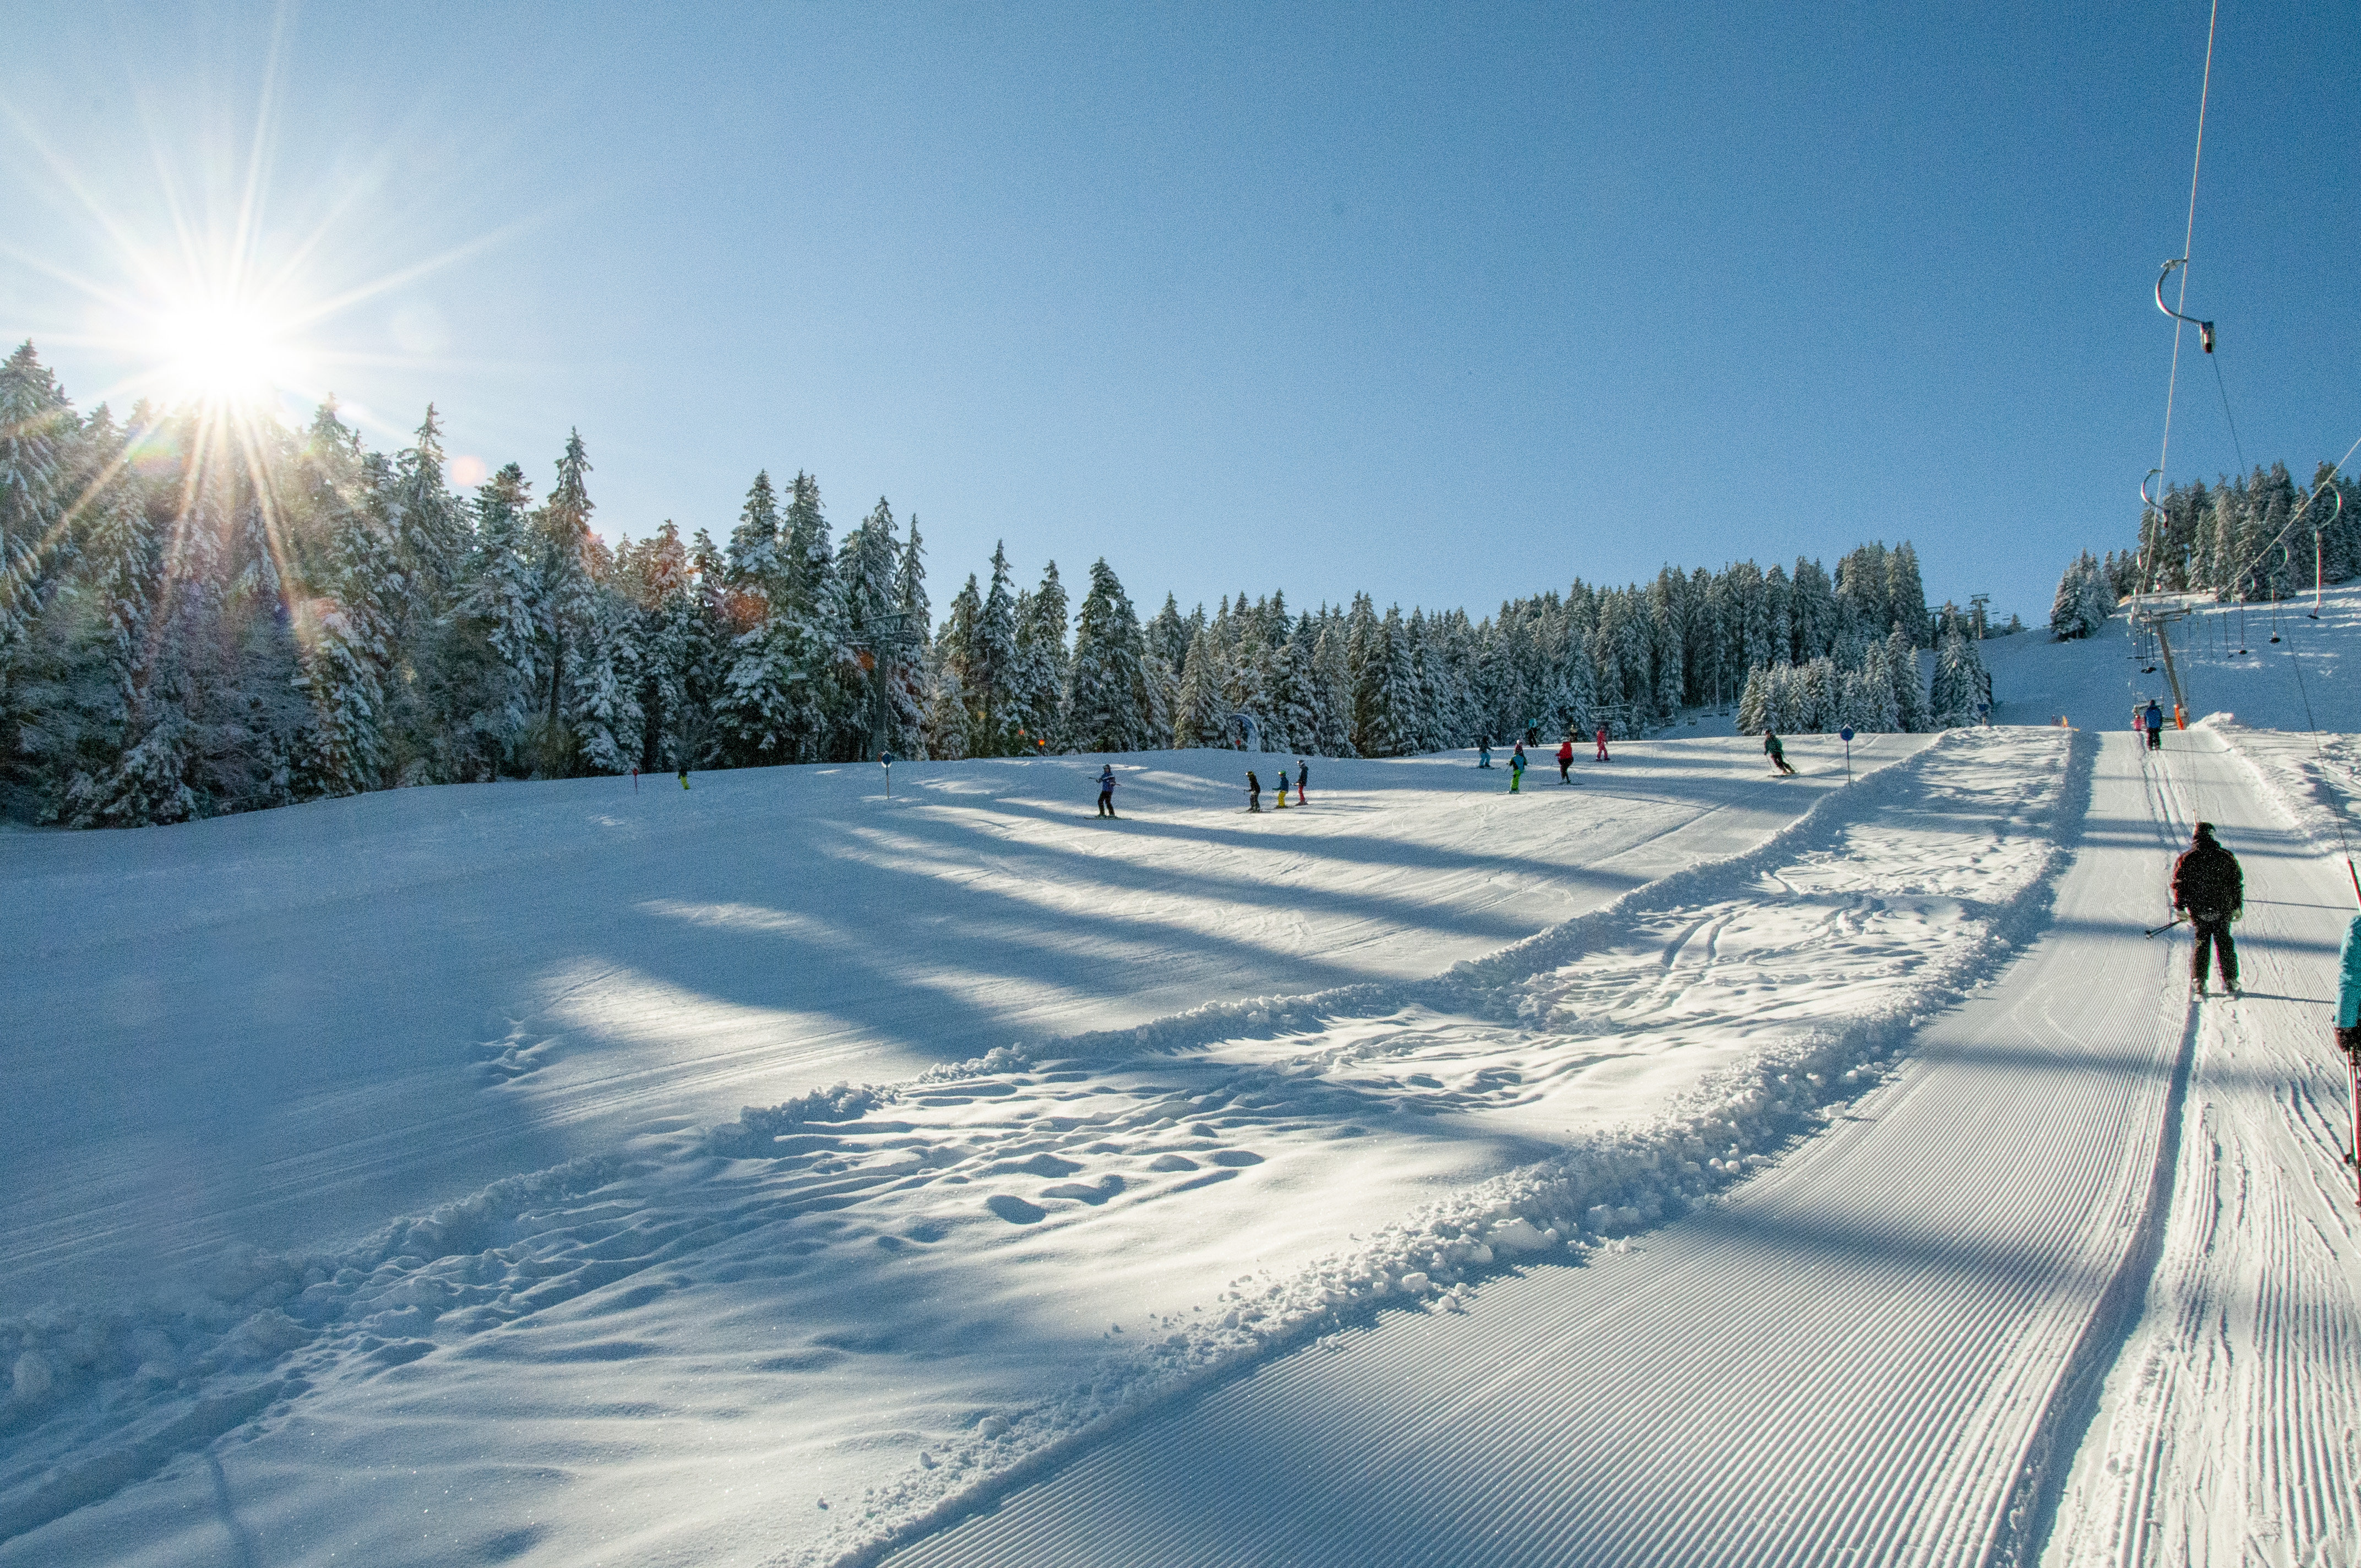 Skigebiet Bödele, Schanzenblicklift / Copyright©Jürgen Kostelac, Dornbirner Seilbahn AG